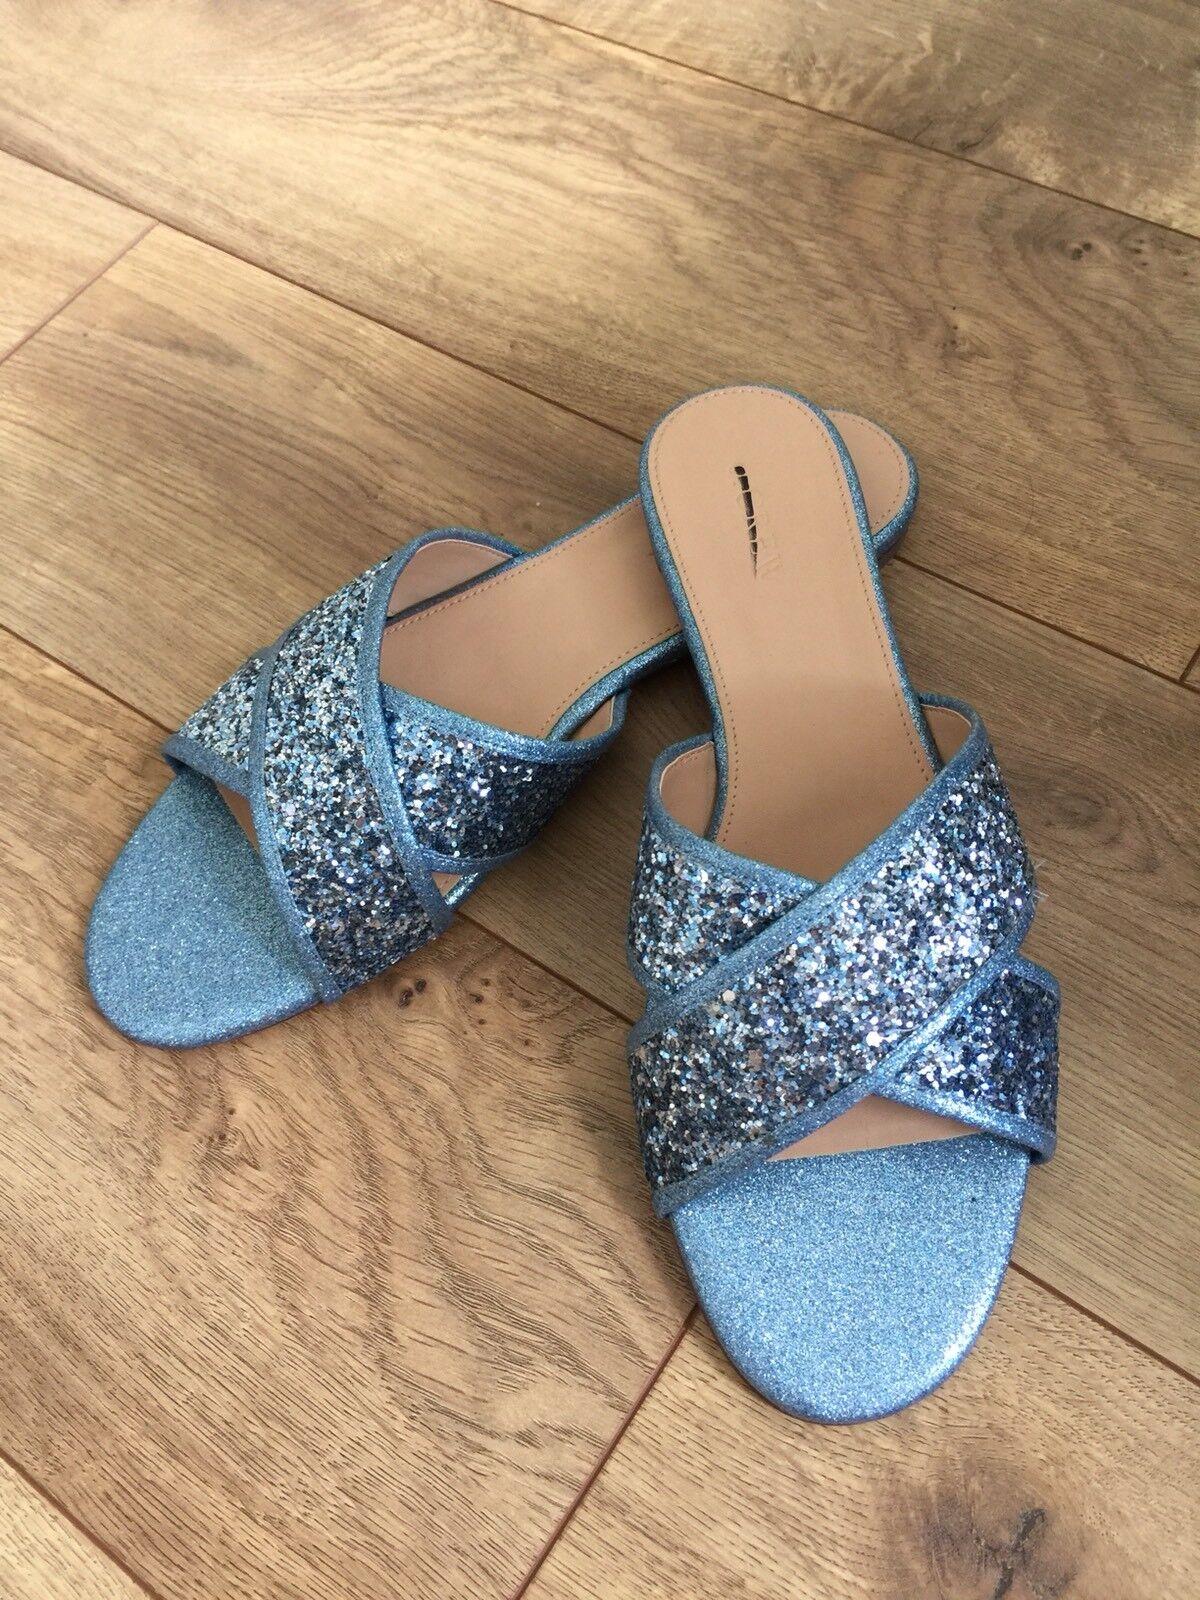 NEU Jcrew Glitter Cora crisscross Sandale Ocean Glitter Blau 9.5 H7334